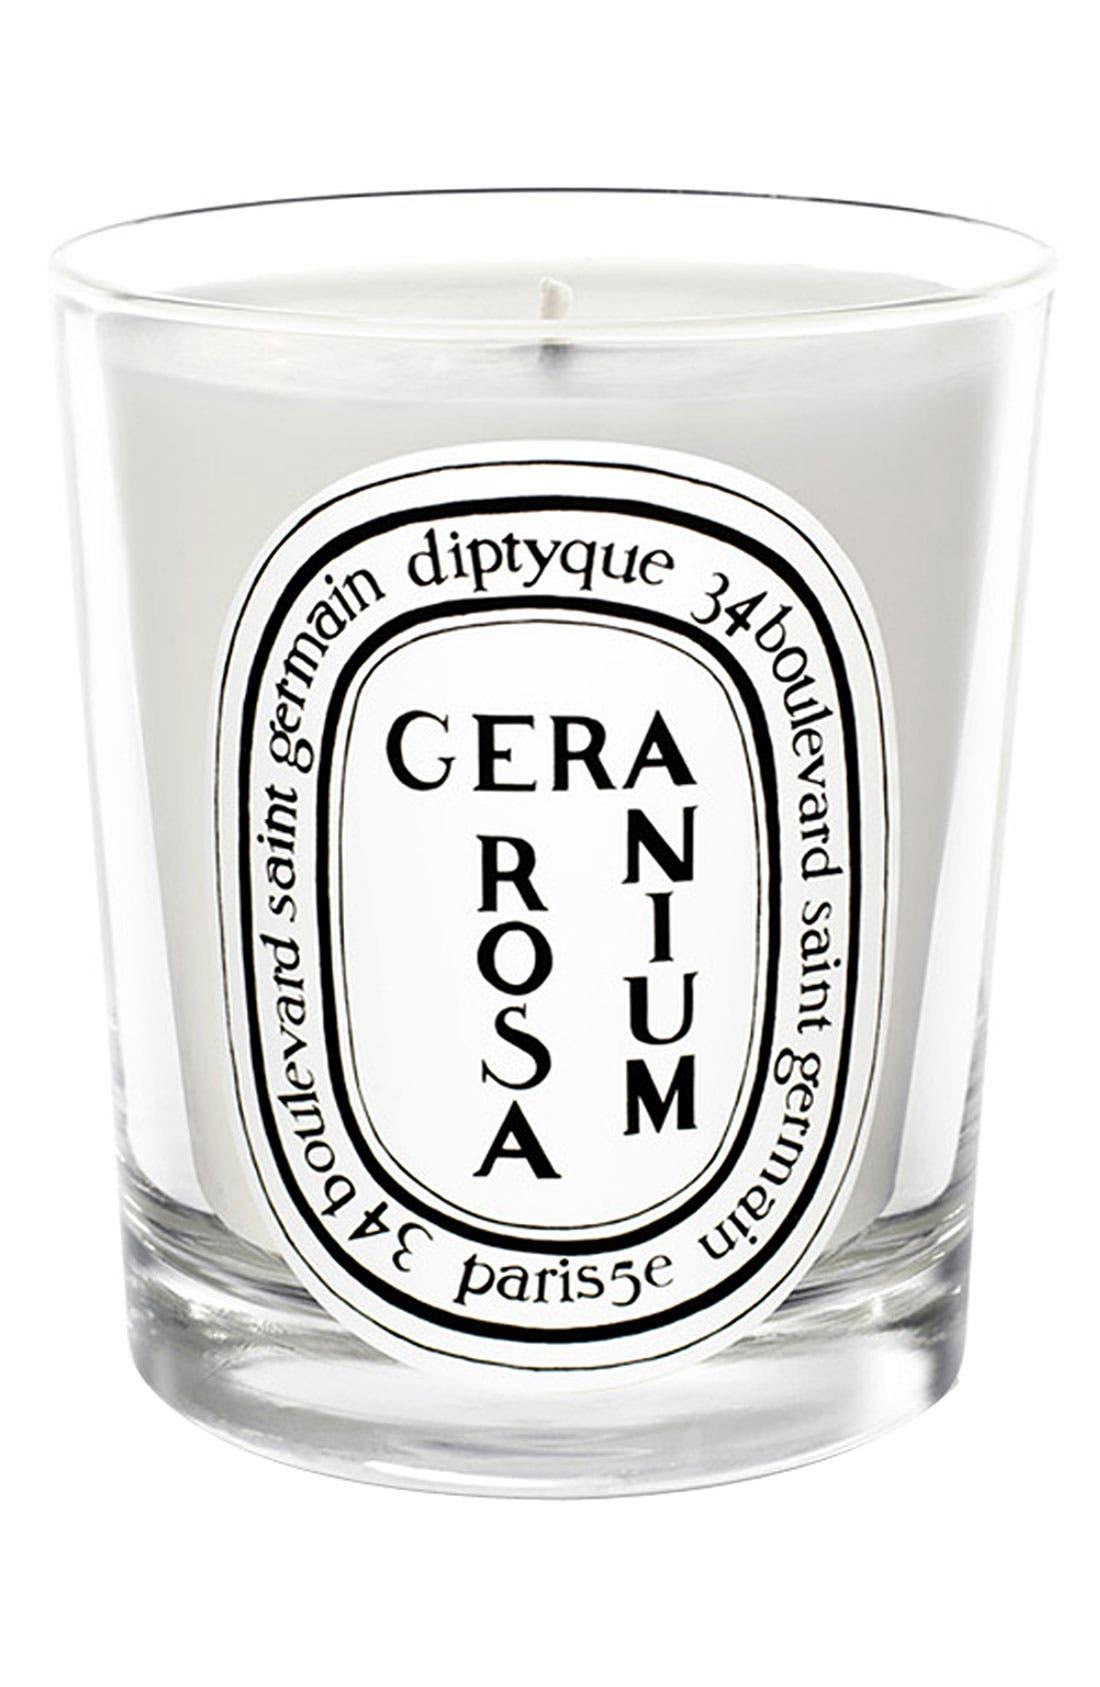 Geranium Rosa/Rose Geranium Scented Candle,                         Main,                         color, NO COLOR